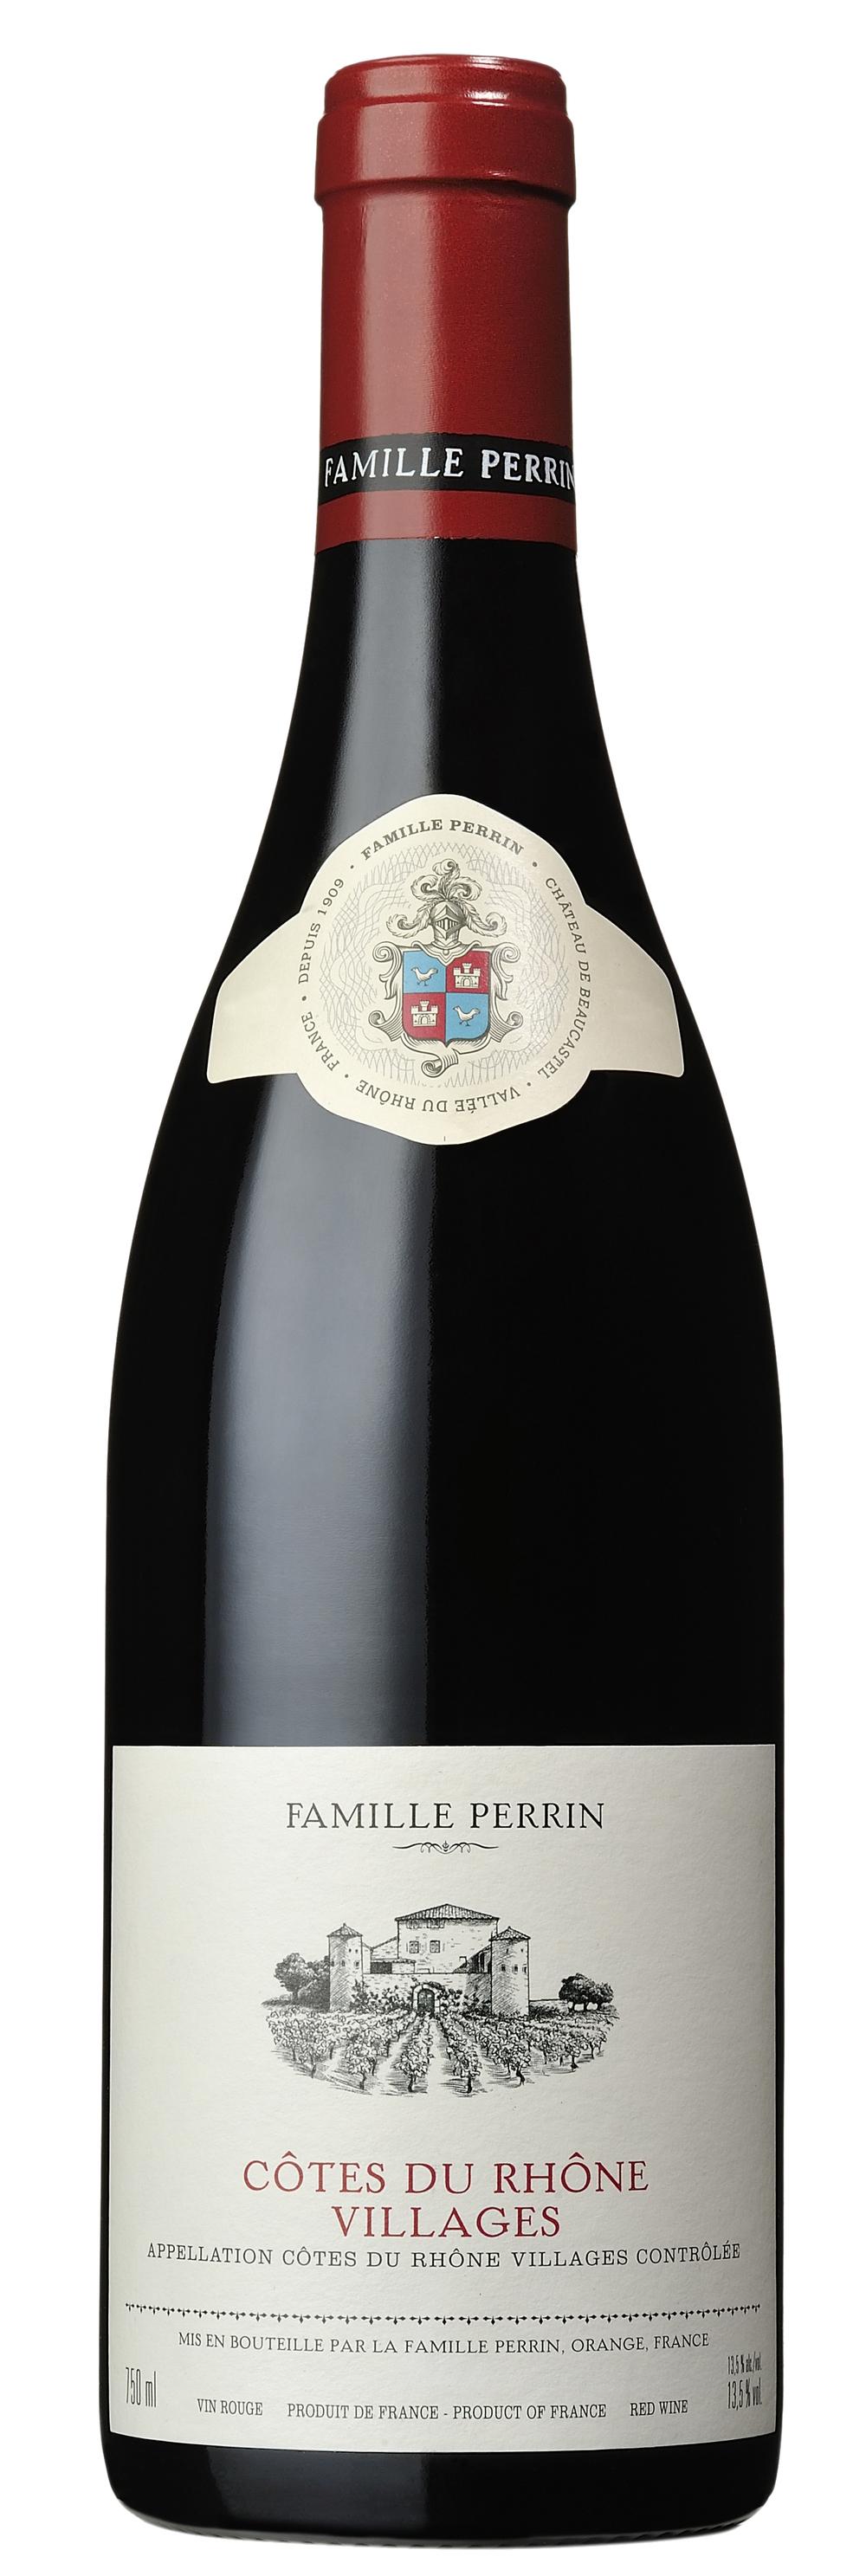 Famille_Perrin Crus Côtes du Rhône Villages Bottle.jpg